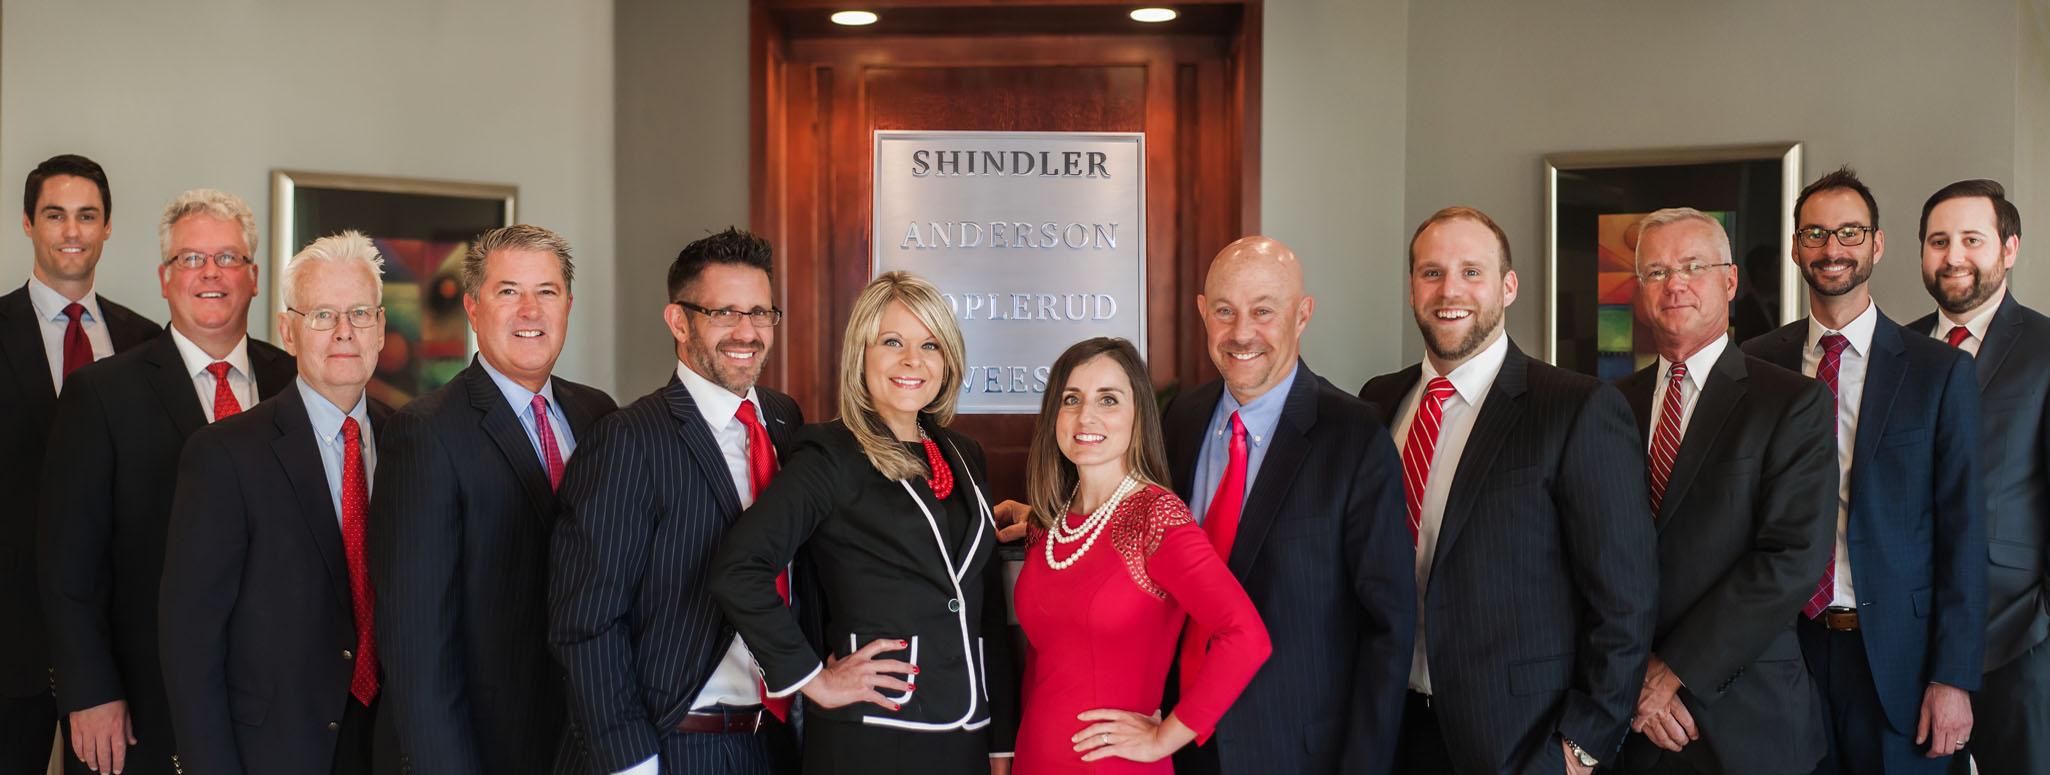 Shindler, Anderson, Goplerud & Weese P.C. West Des Moines, Iowa